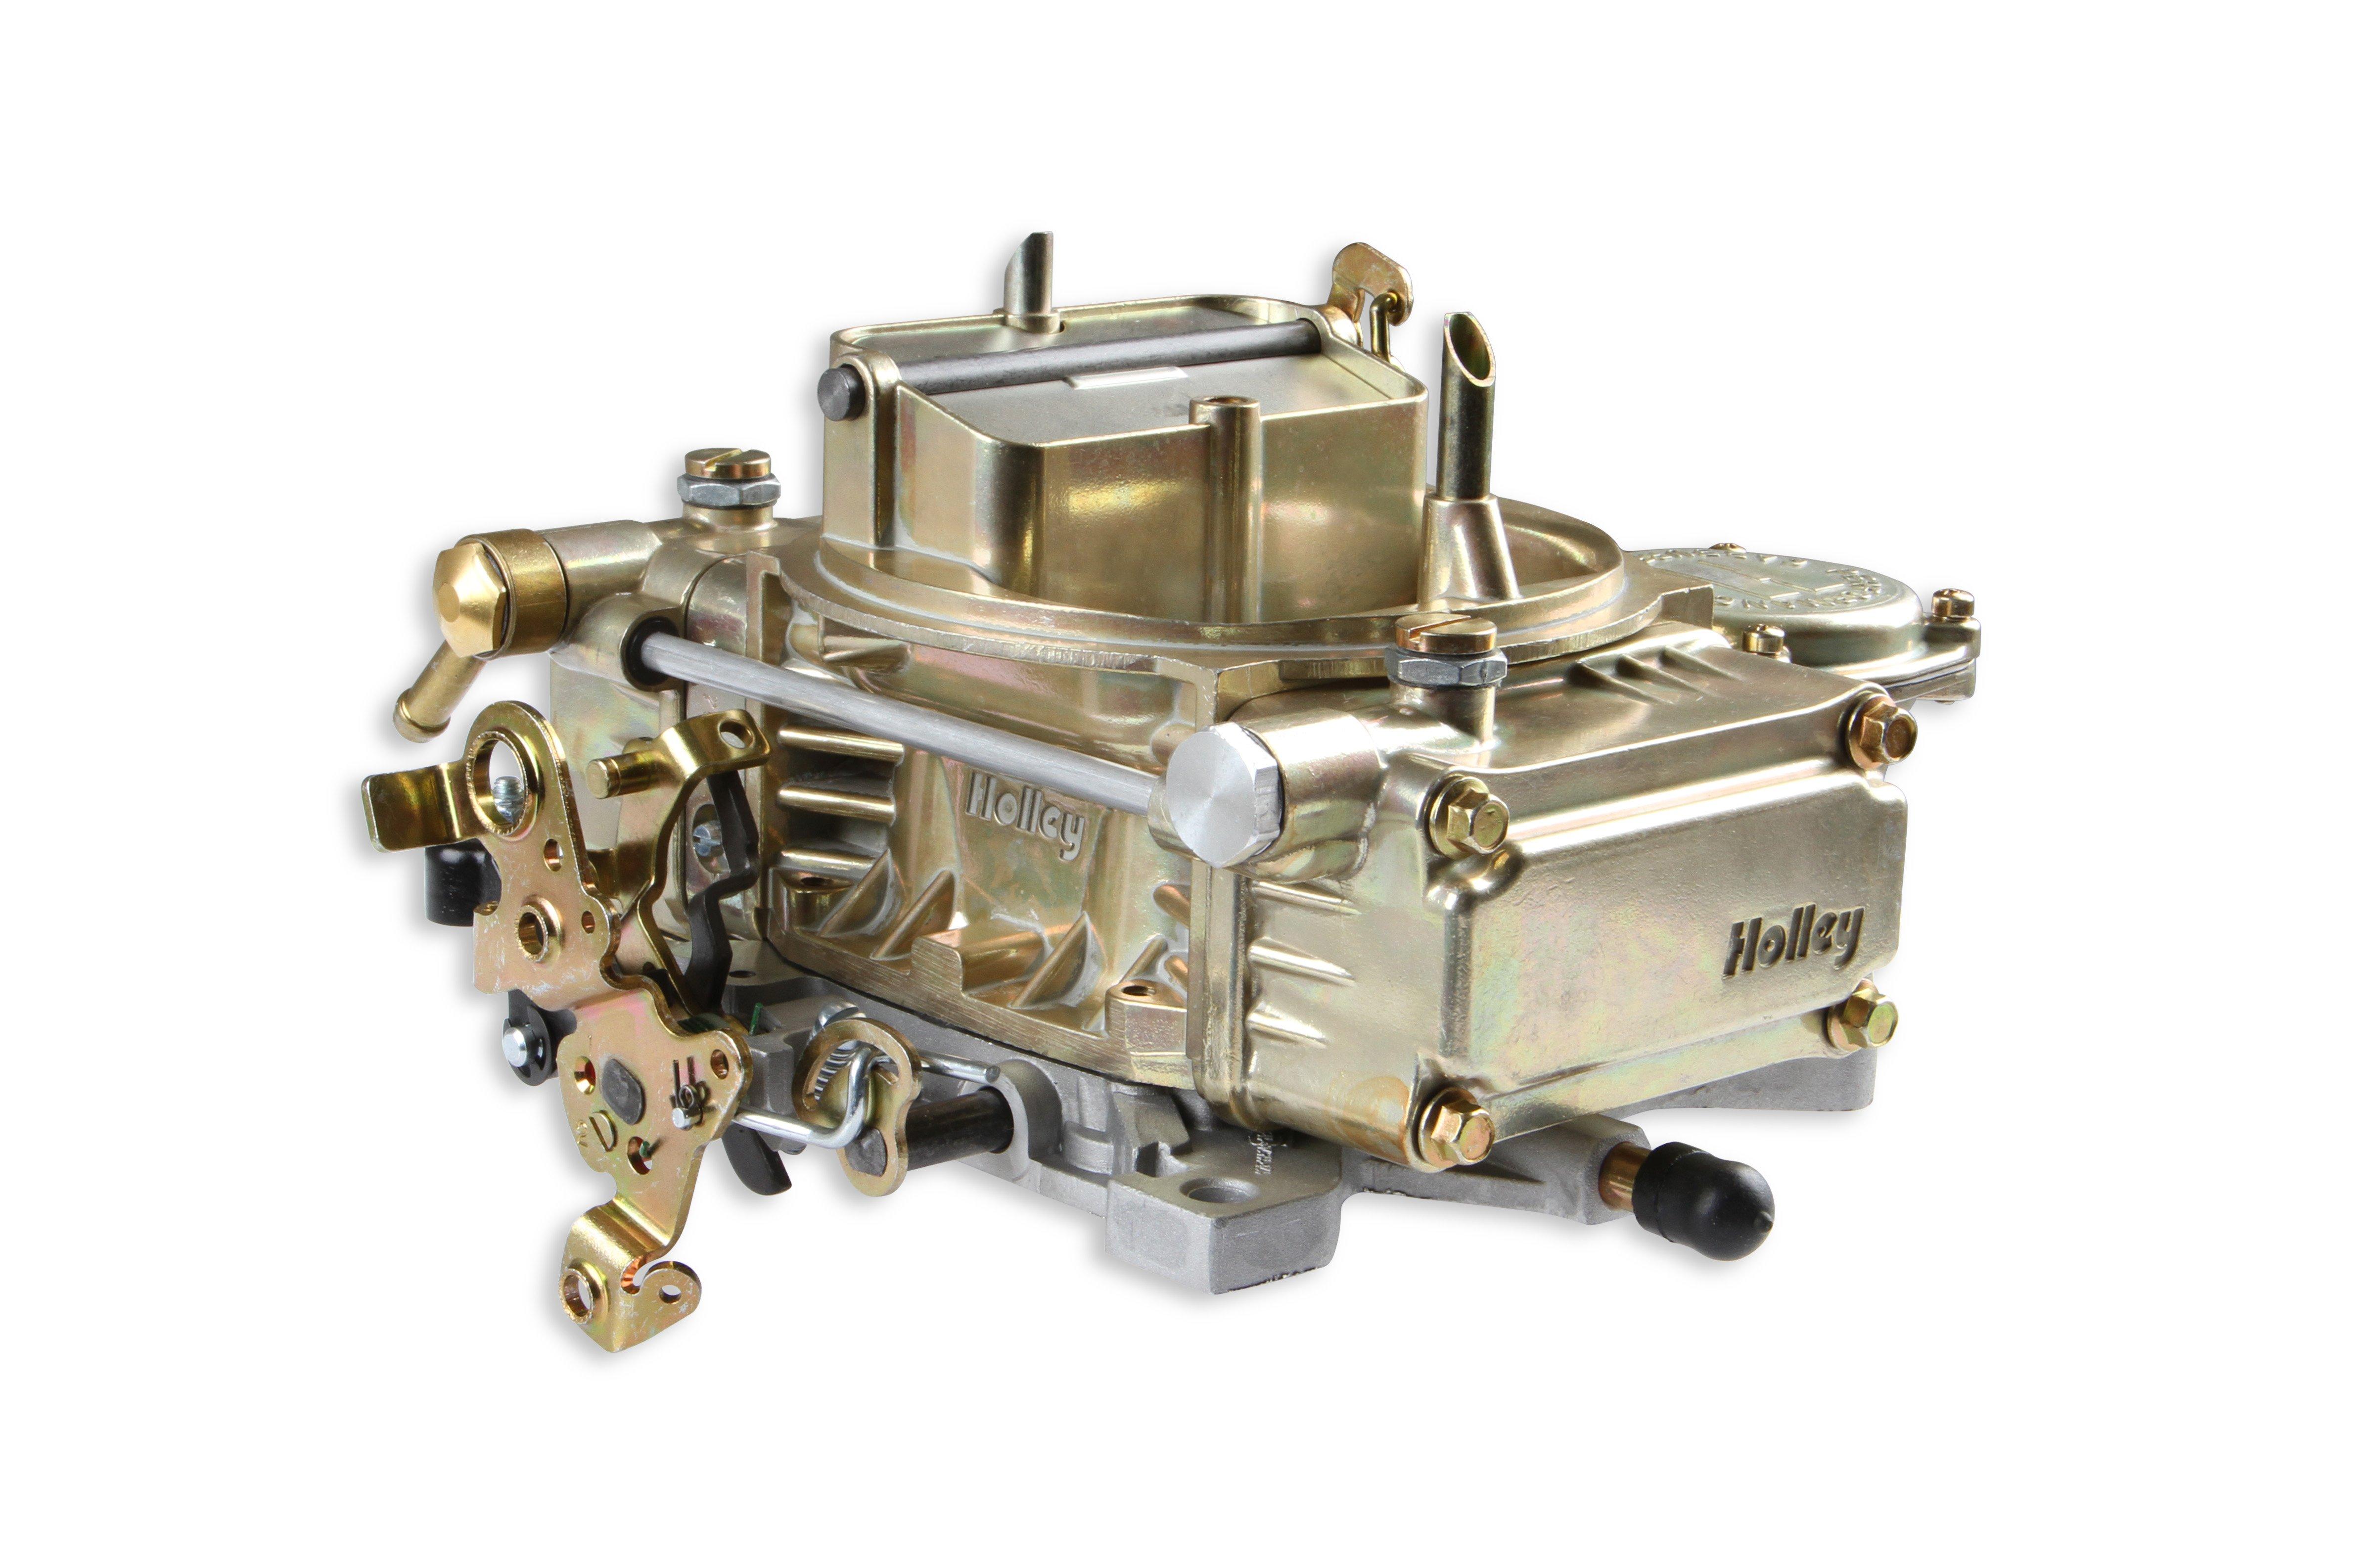 HOLLEY MODEL 4160 UNIVERSAL MARINE 4 BARREL CARBURETOR KIT W//NONADJUSTABLE FLOAT